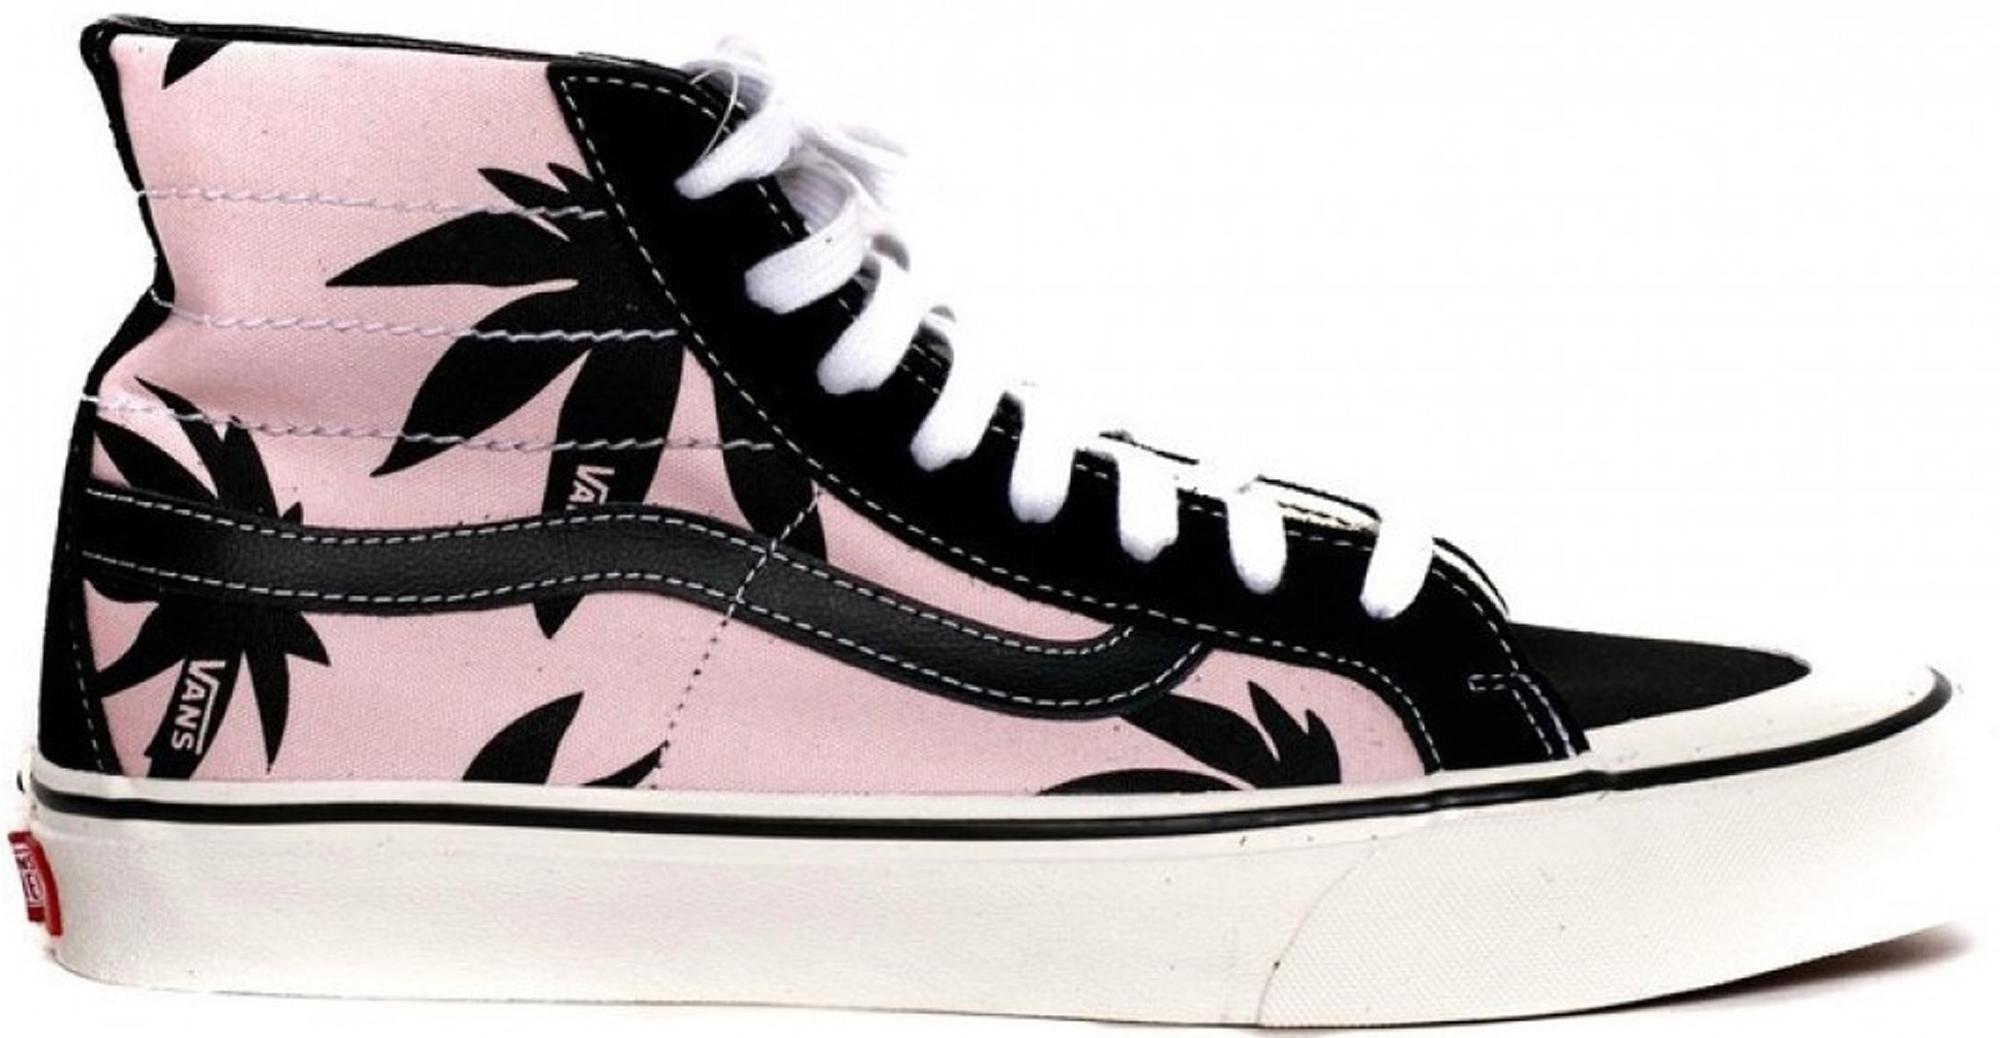 ea47dd78fb Long-Touch to Zoom. Vans - Sk8-hi 138 Decon Summer Leaf Pink Black for Men  - Lyst. View fullscreen